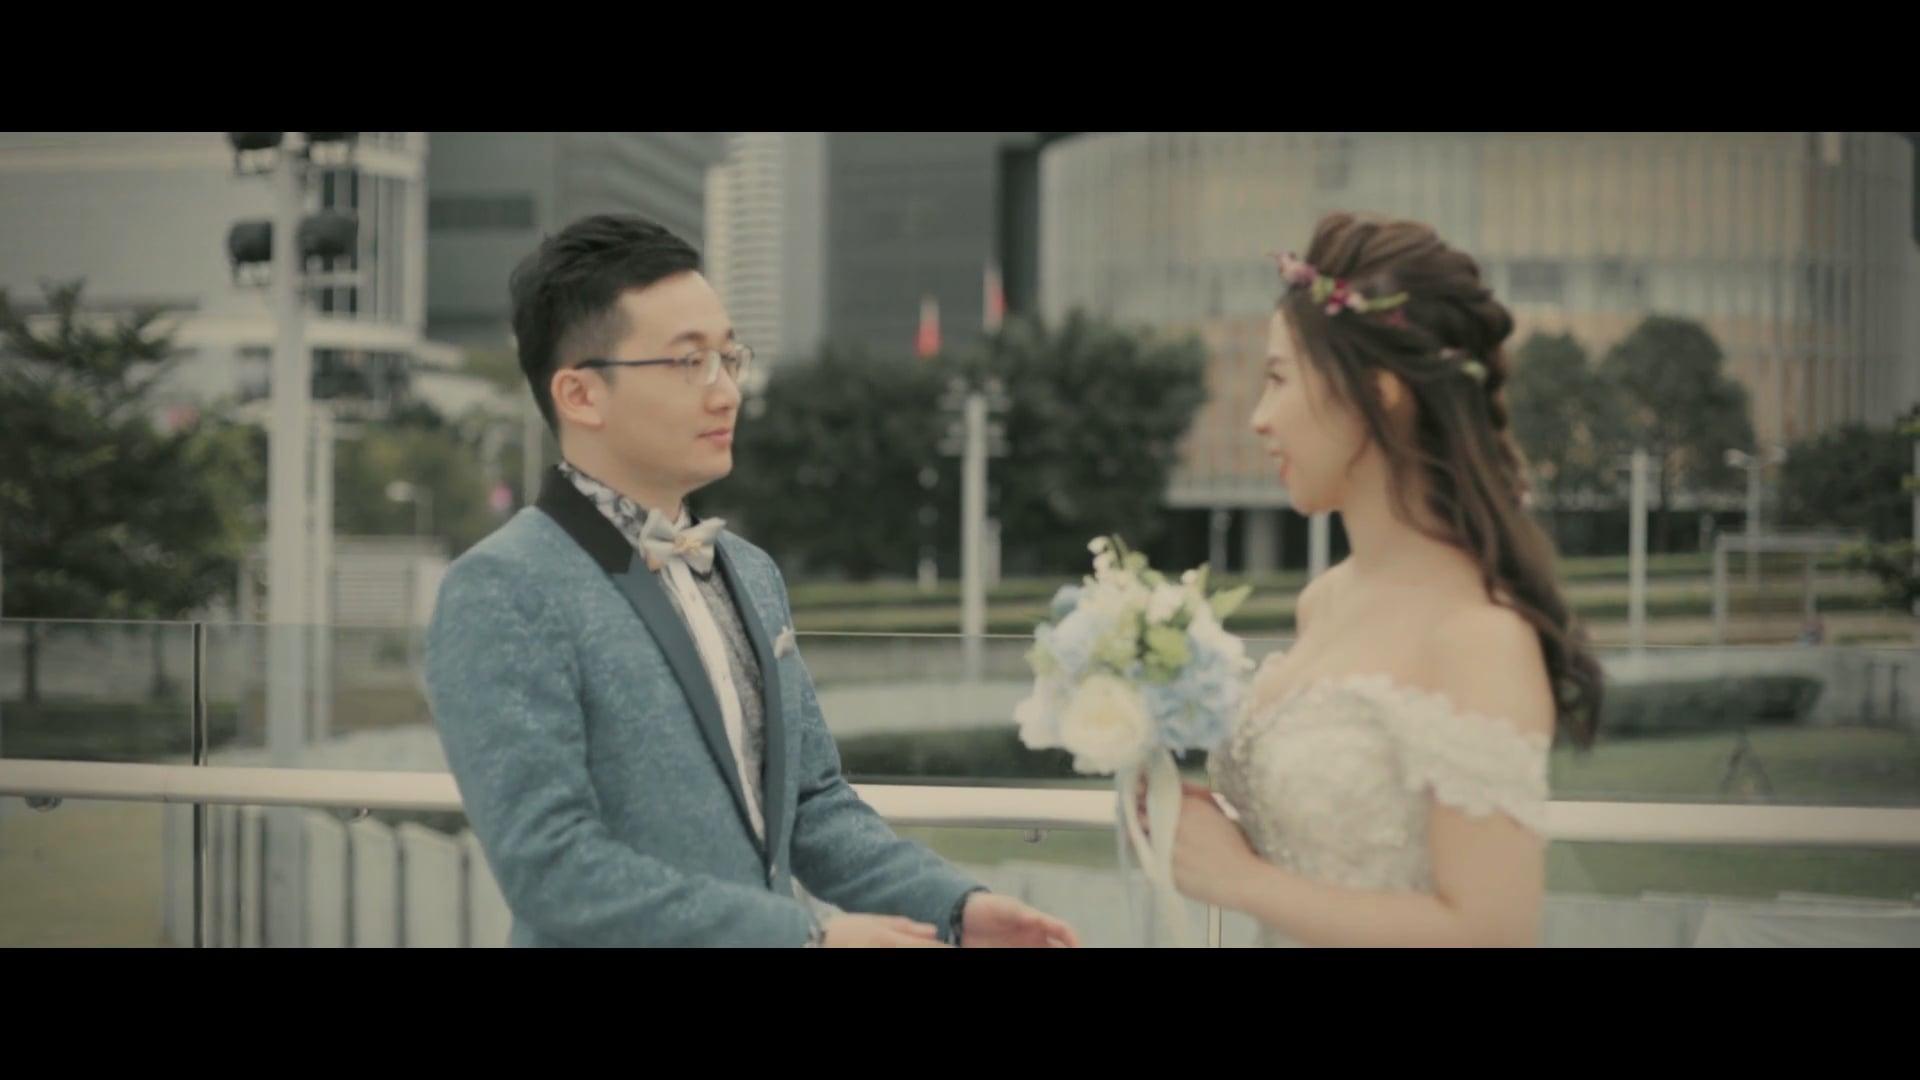 Same Day Edit MV 即日剪片 - Edith & Brian (無故事主題)